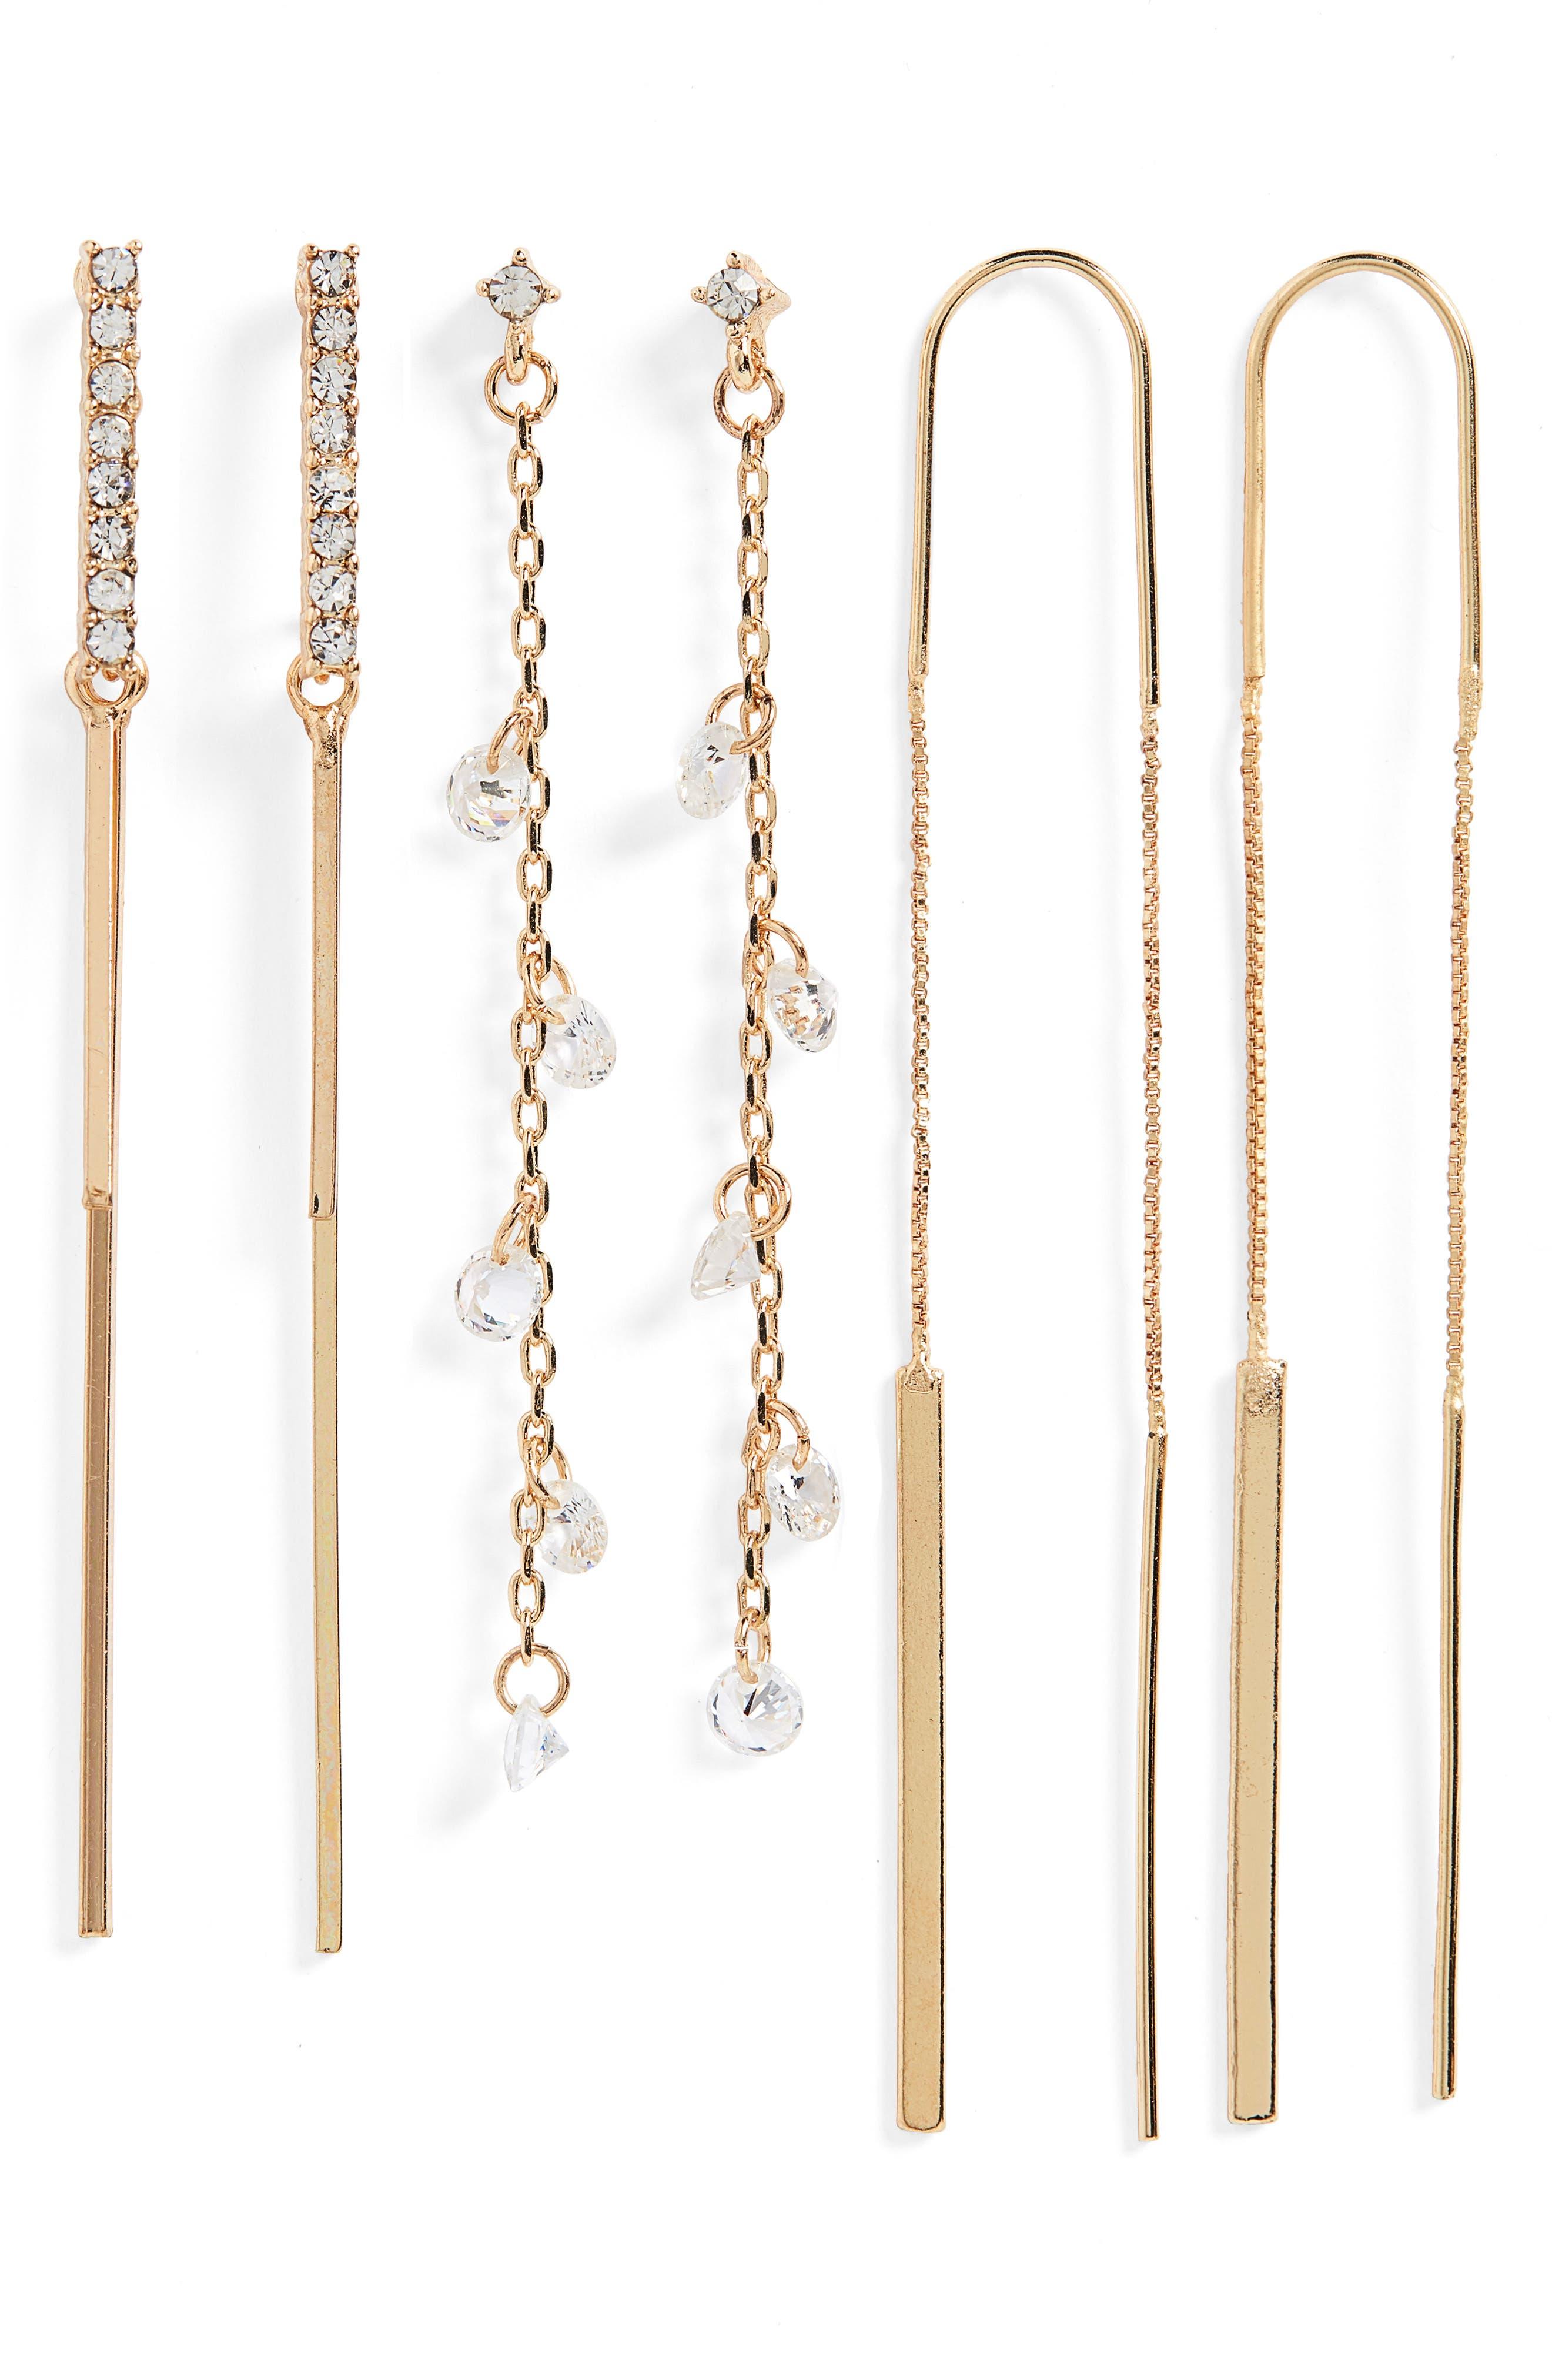 3-Pack Crystal Linear Earrings,                             Main thumbnail 1, color,                             710